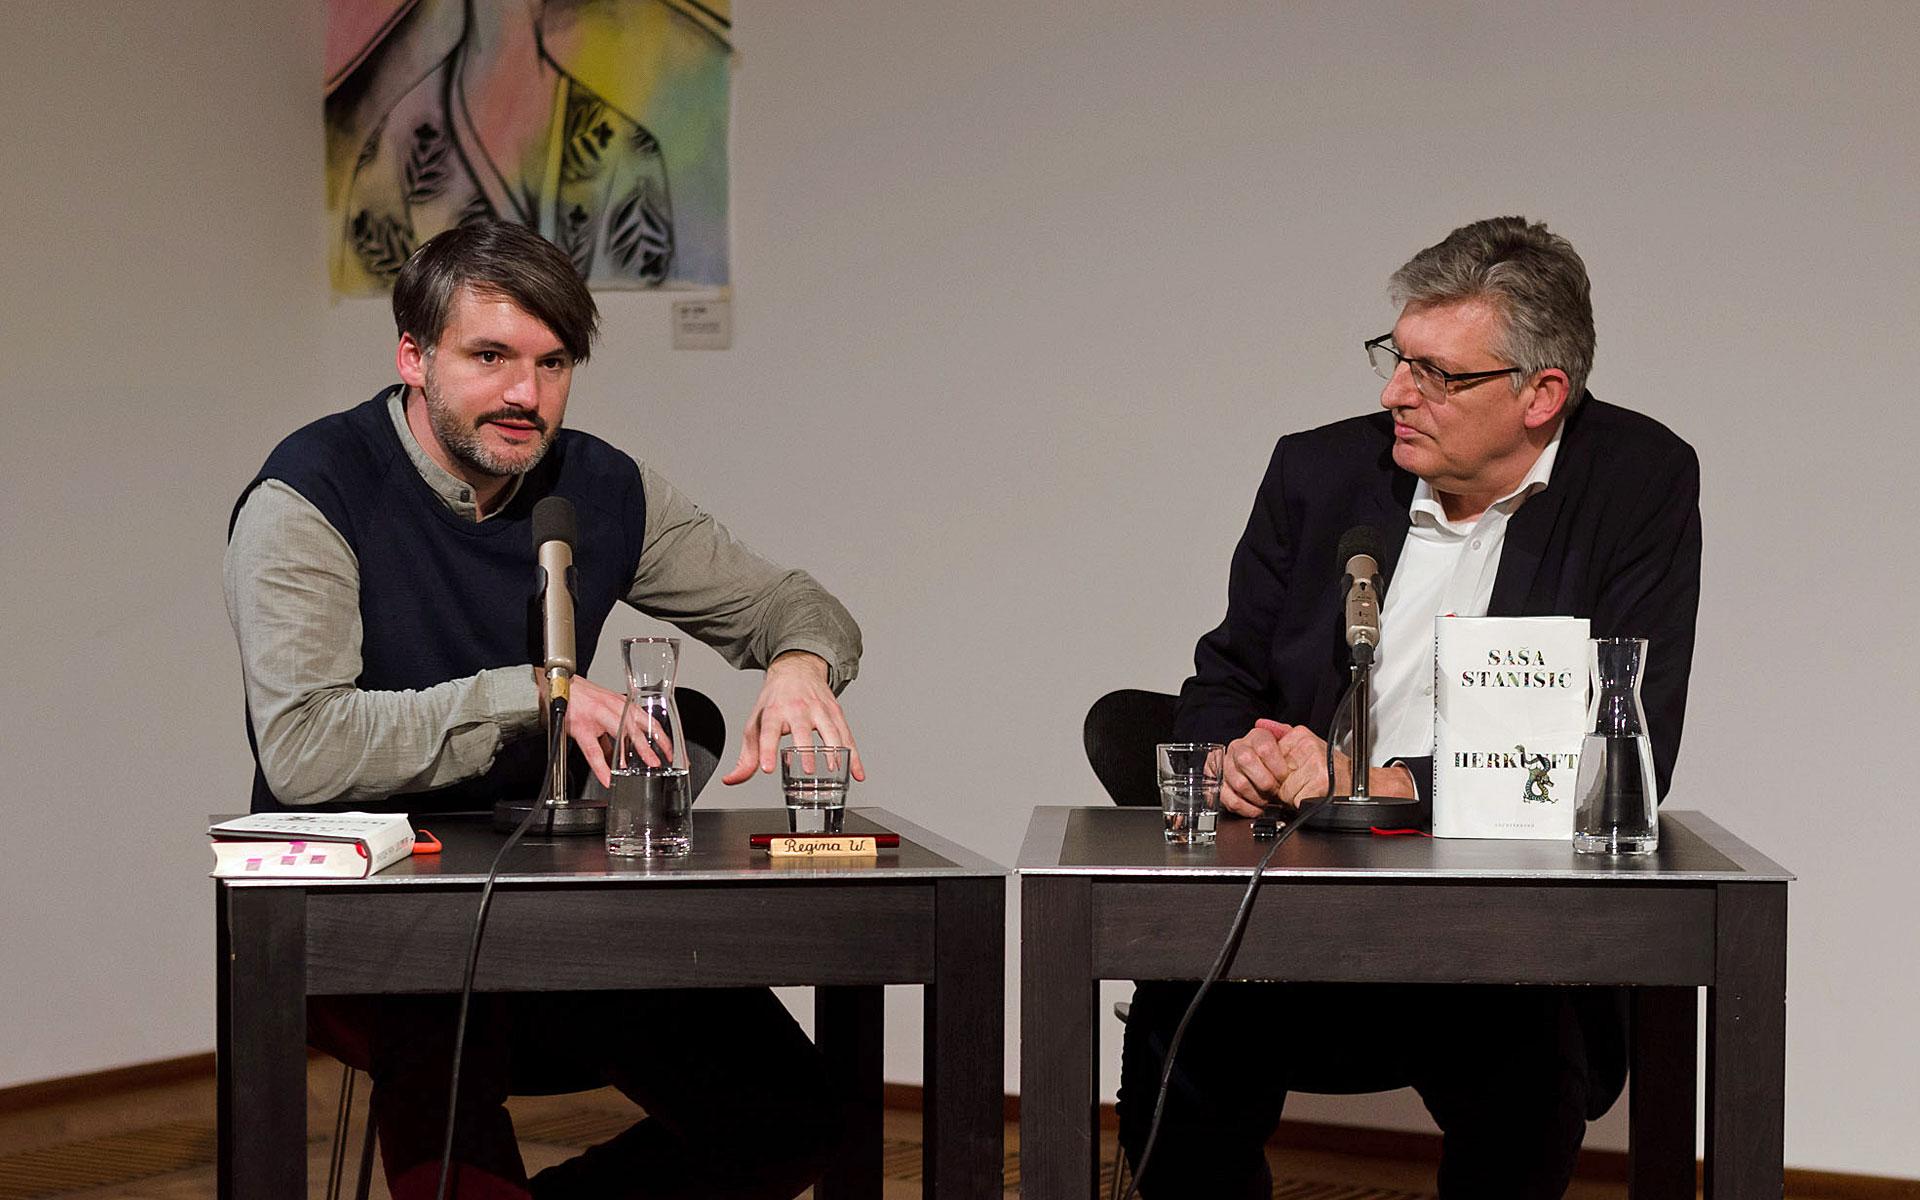 Saša Stanišić: Herkunft,                                                               Freitag, 29.03.19               /                   19.30              Uhr                               <br/>(c) Simon Adolphi